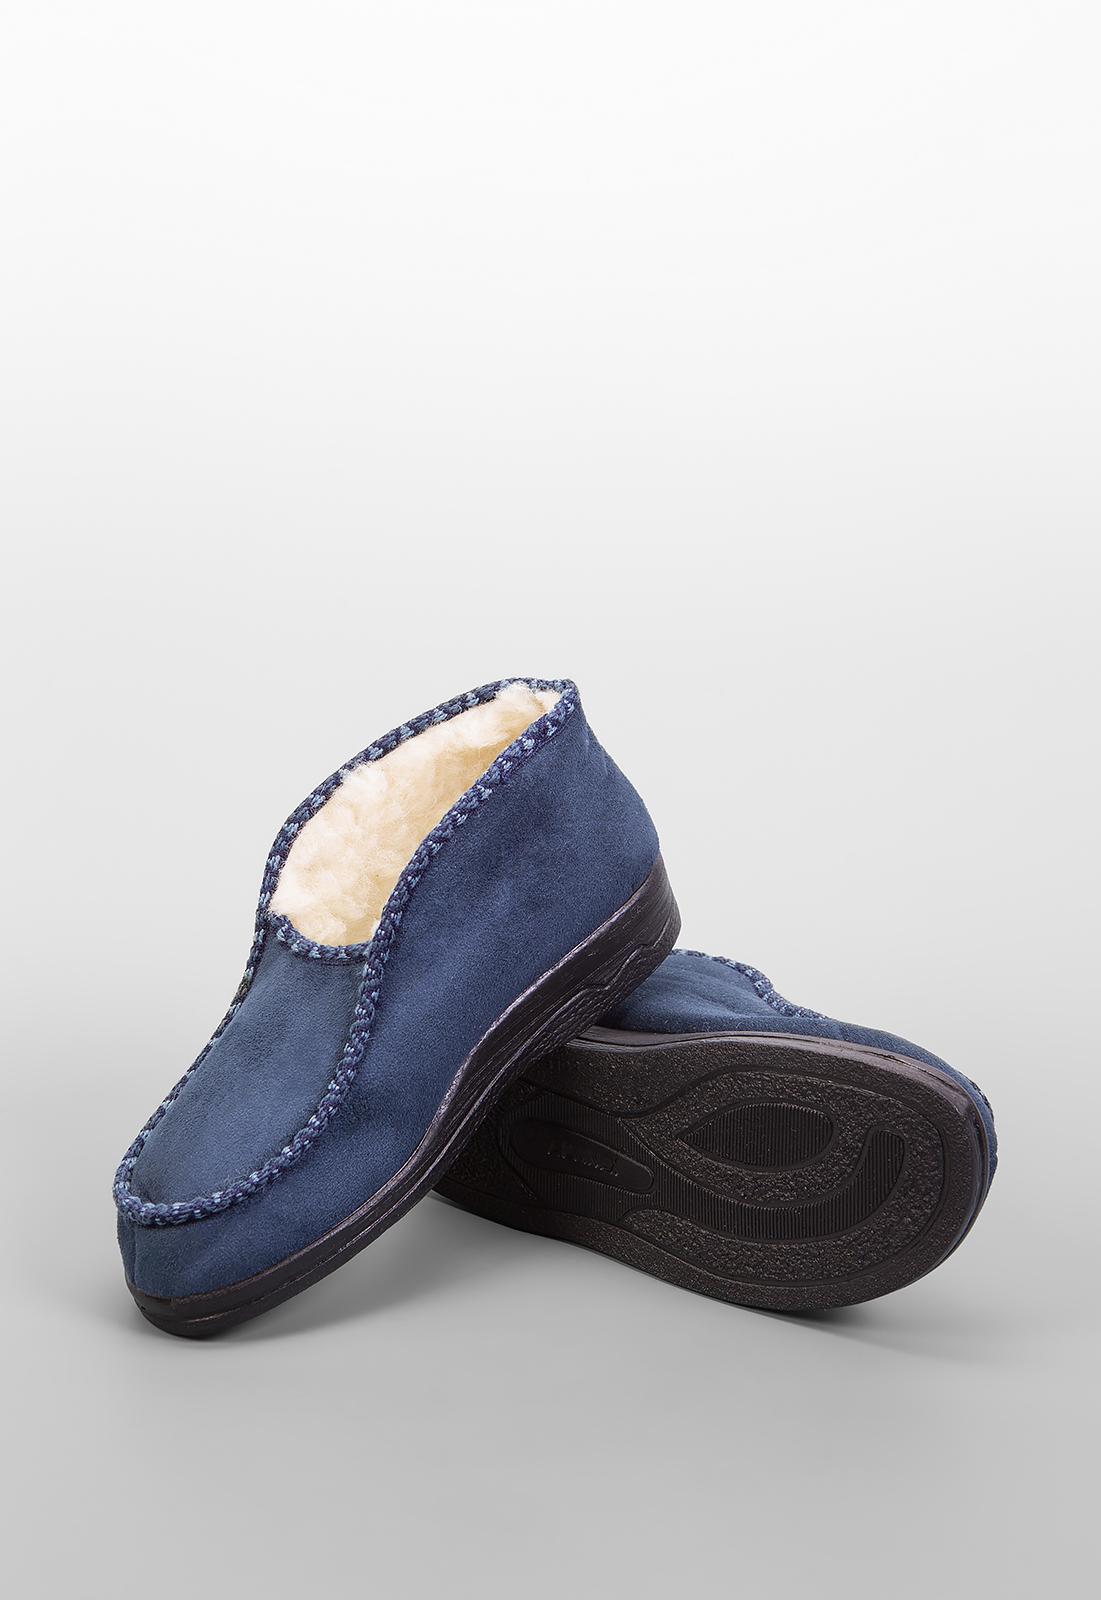 Домашние тапочки женские Anex 16001 синие 38 RU